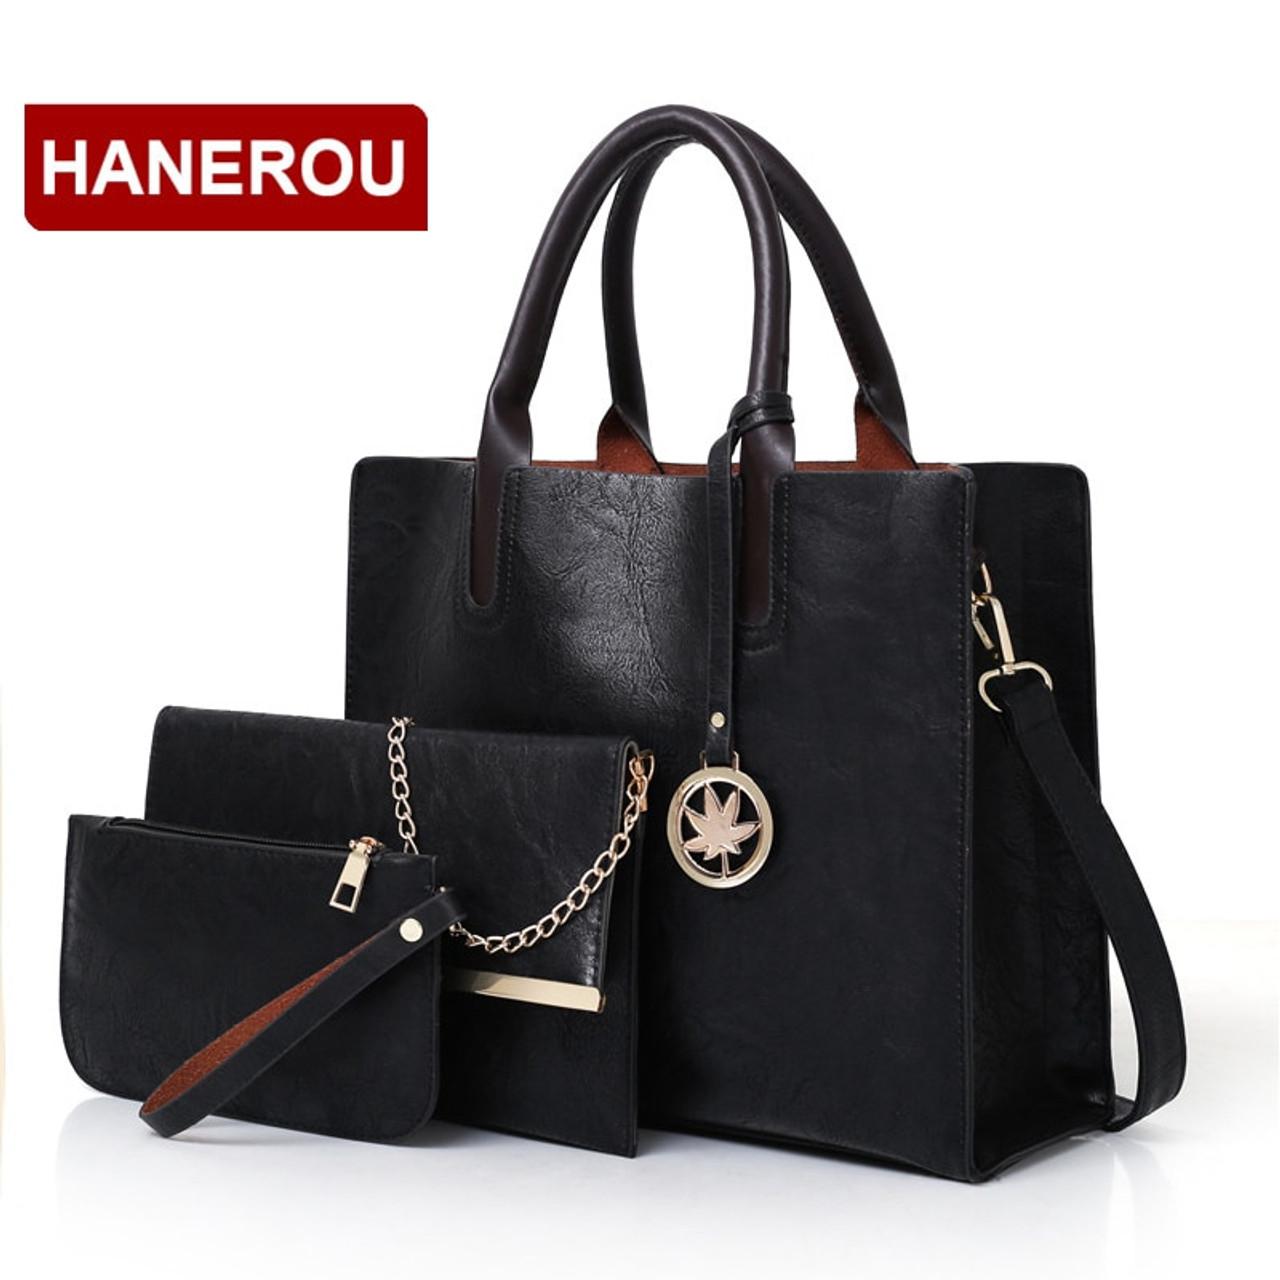 84863476f360 ... 2018 New Women Bags Set 3 Pcs Leather Handbag Women Large Tote Bags  Ladies Shoulder Bag ...